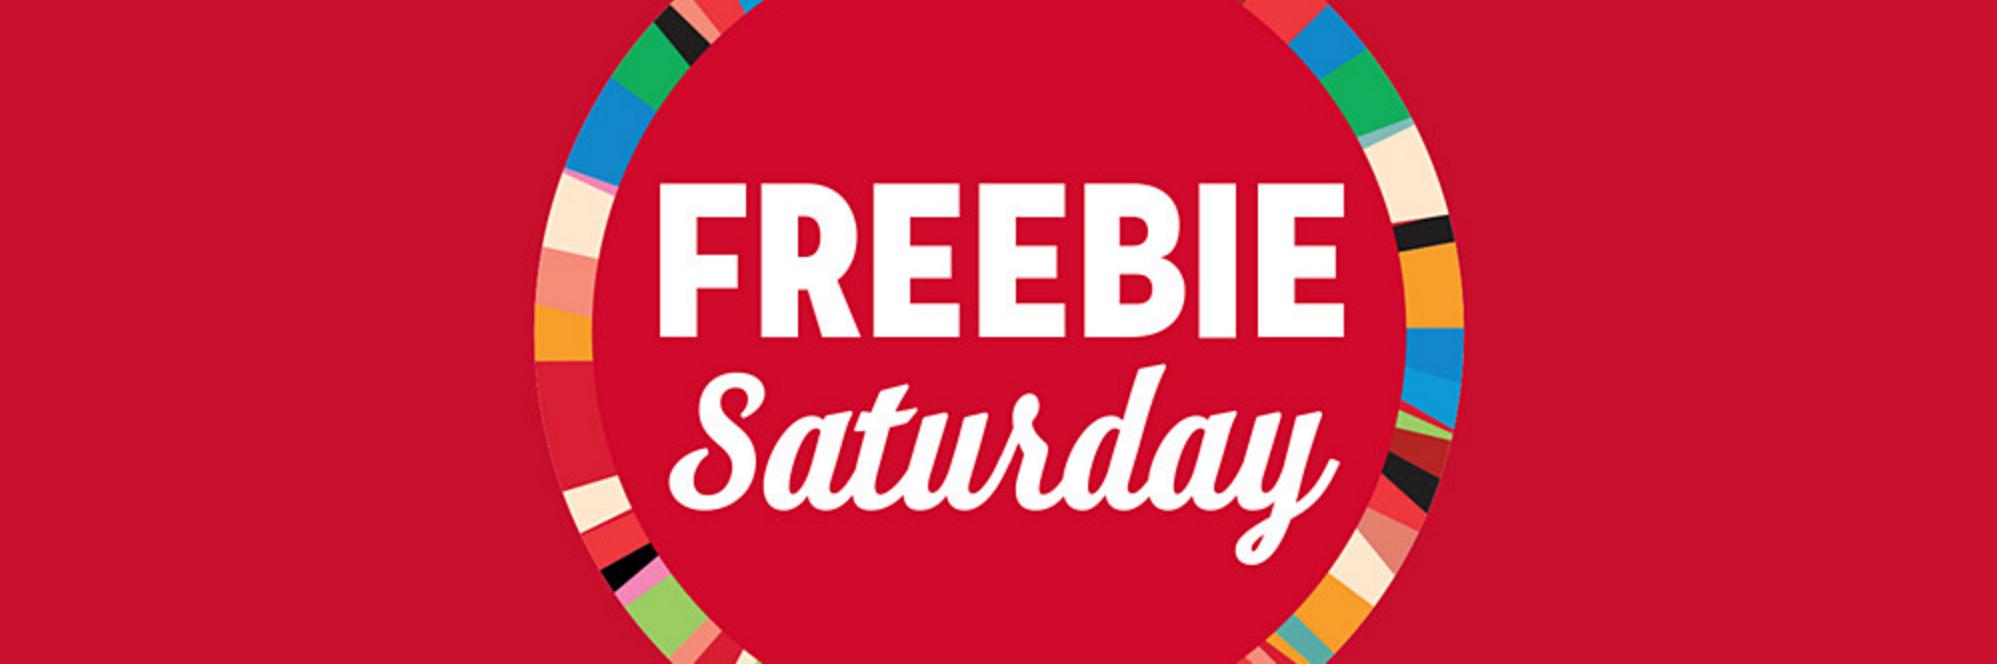 Kmart Freebie Saturday – Frisbee y Cubo de Playa